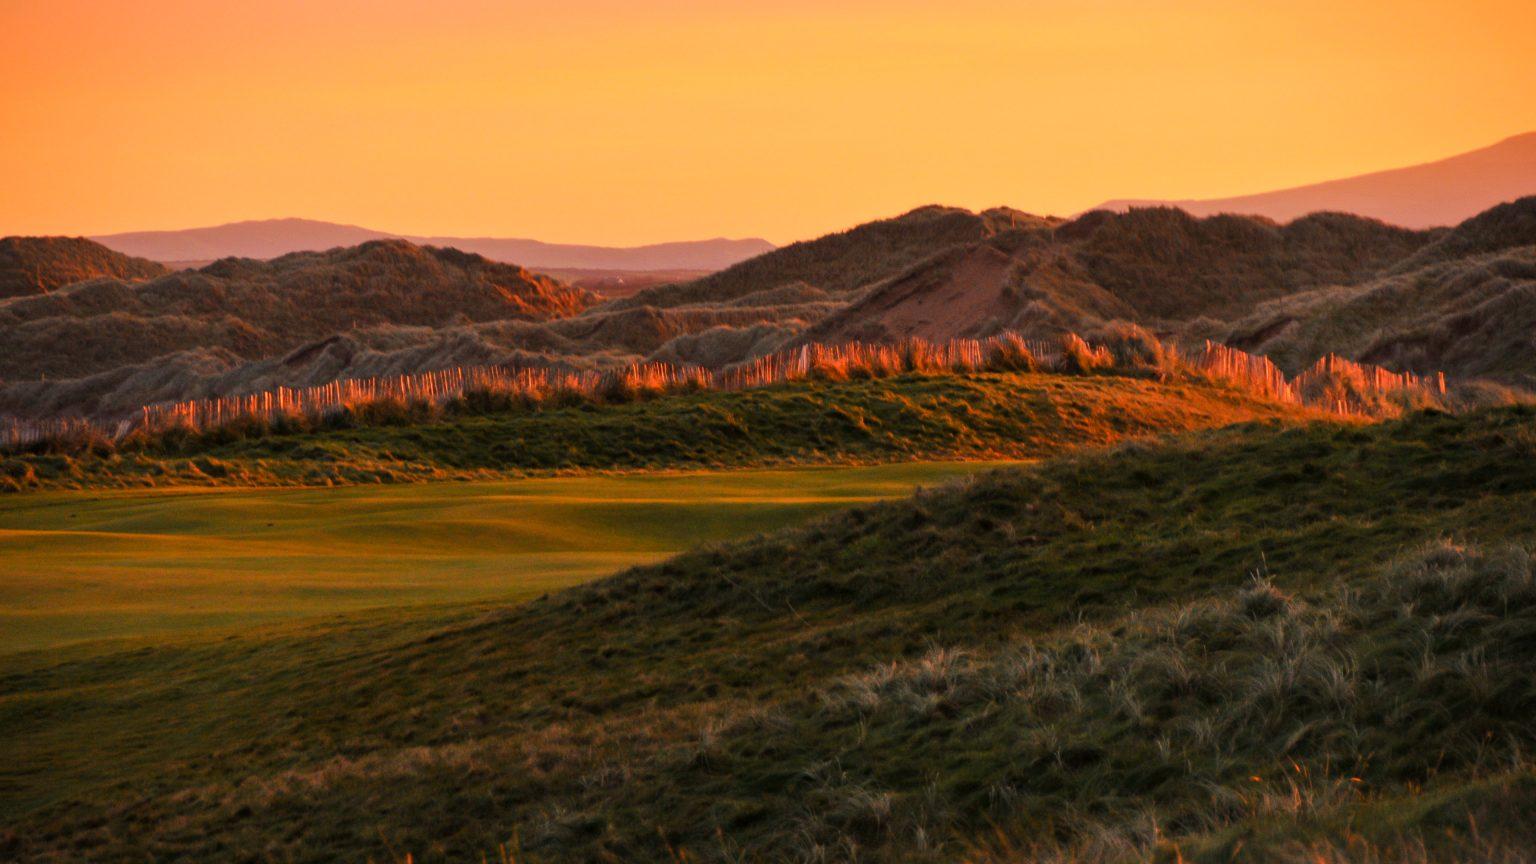 Trump International Golf Links Doonbeg, Ireland